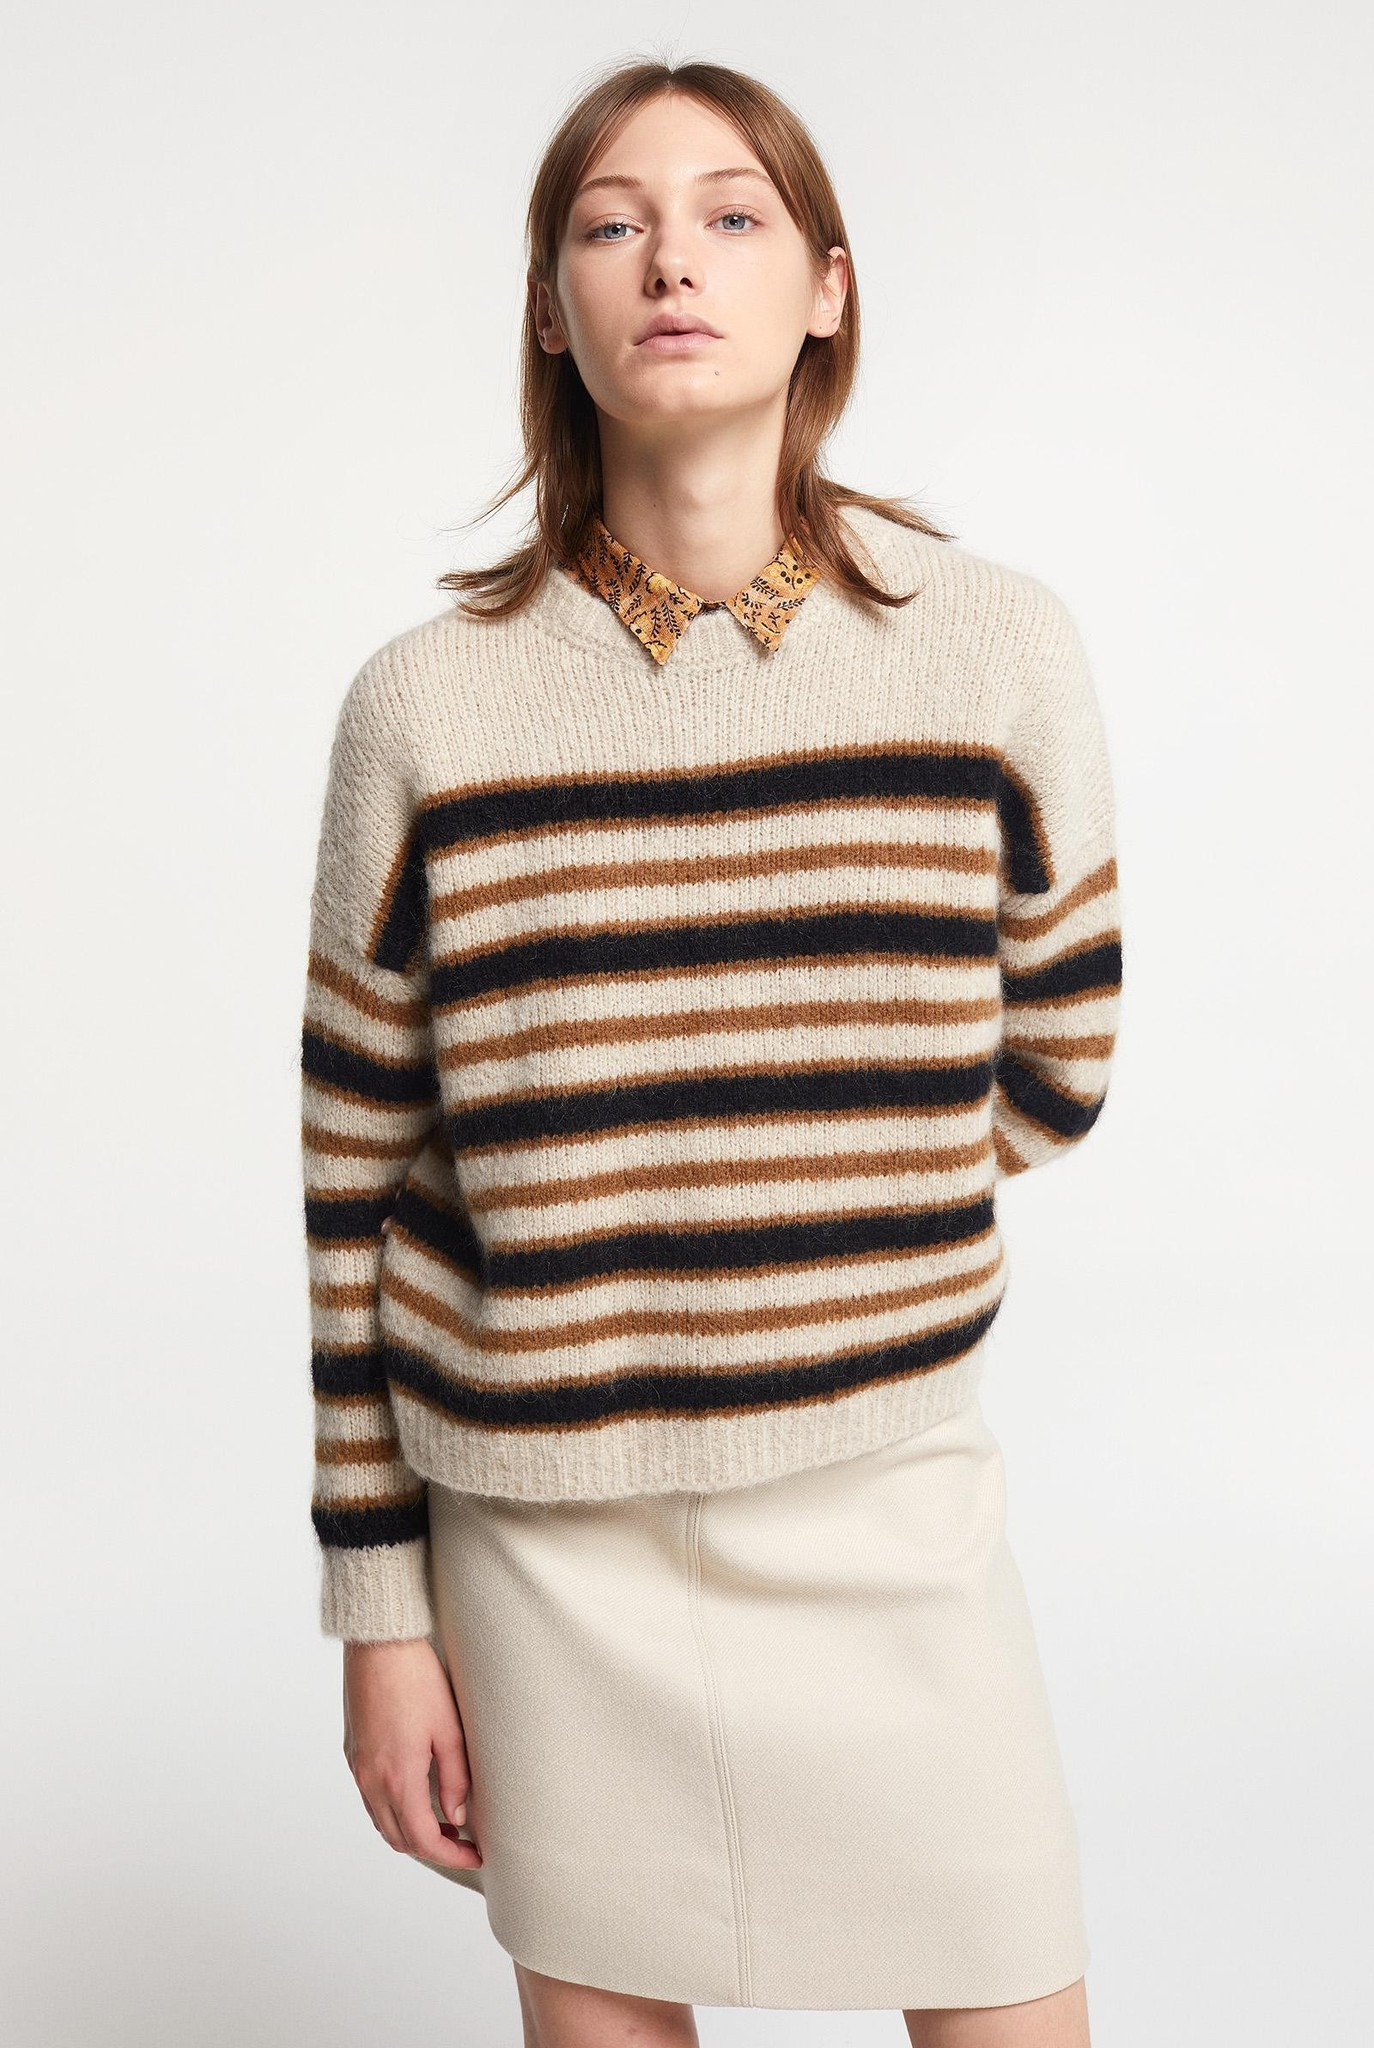 Knit Sweater Beige Stripes Brown